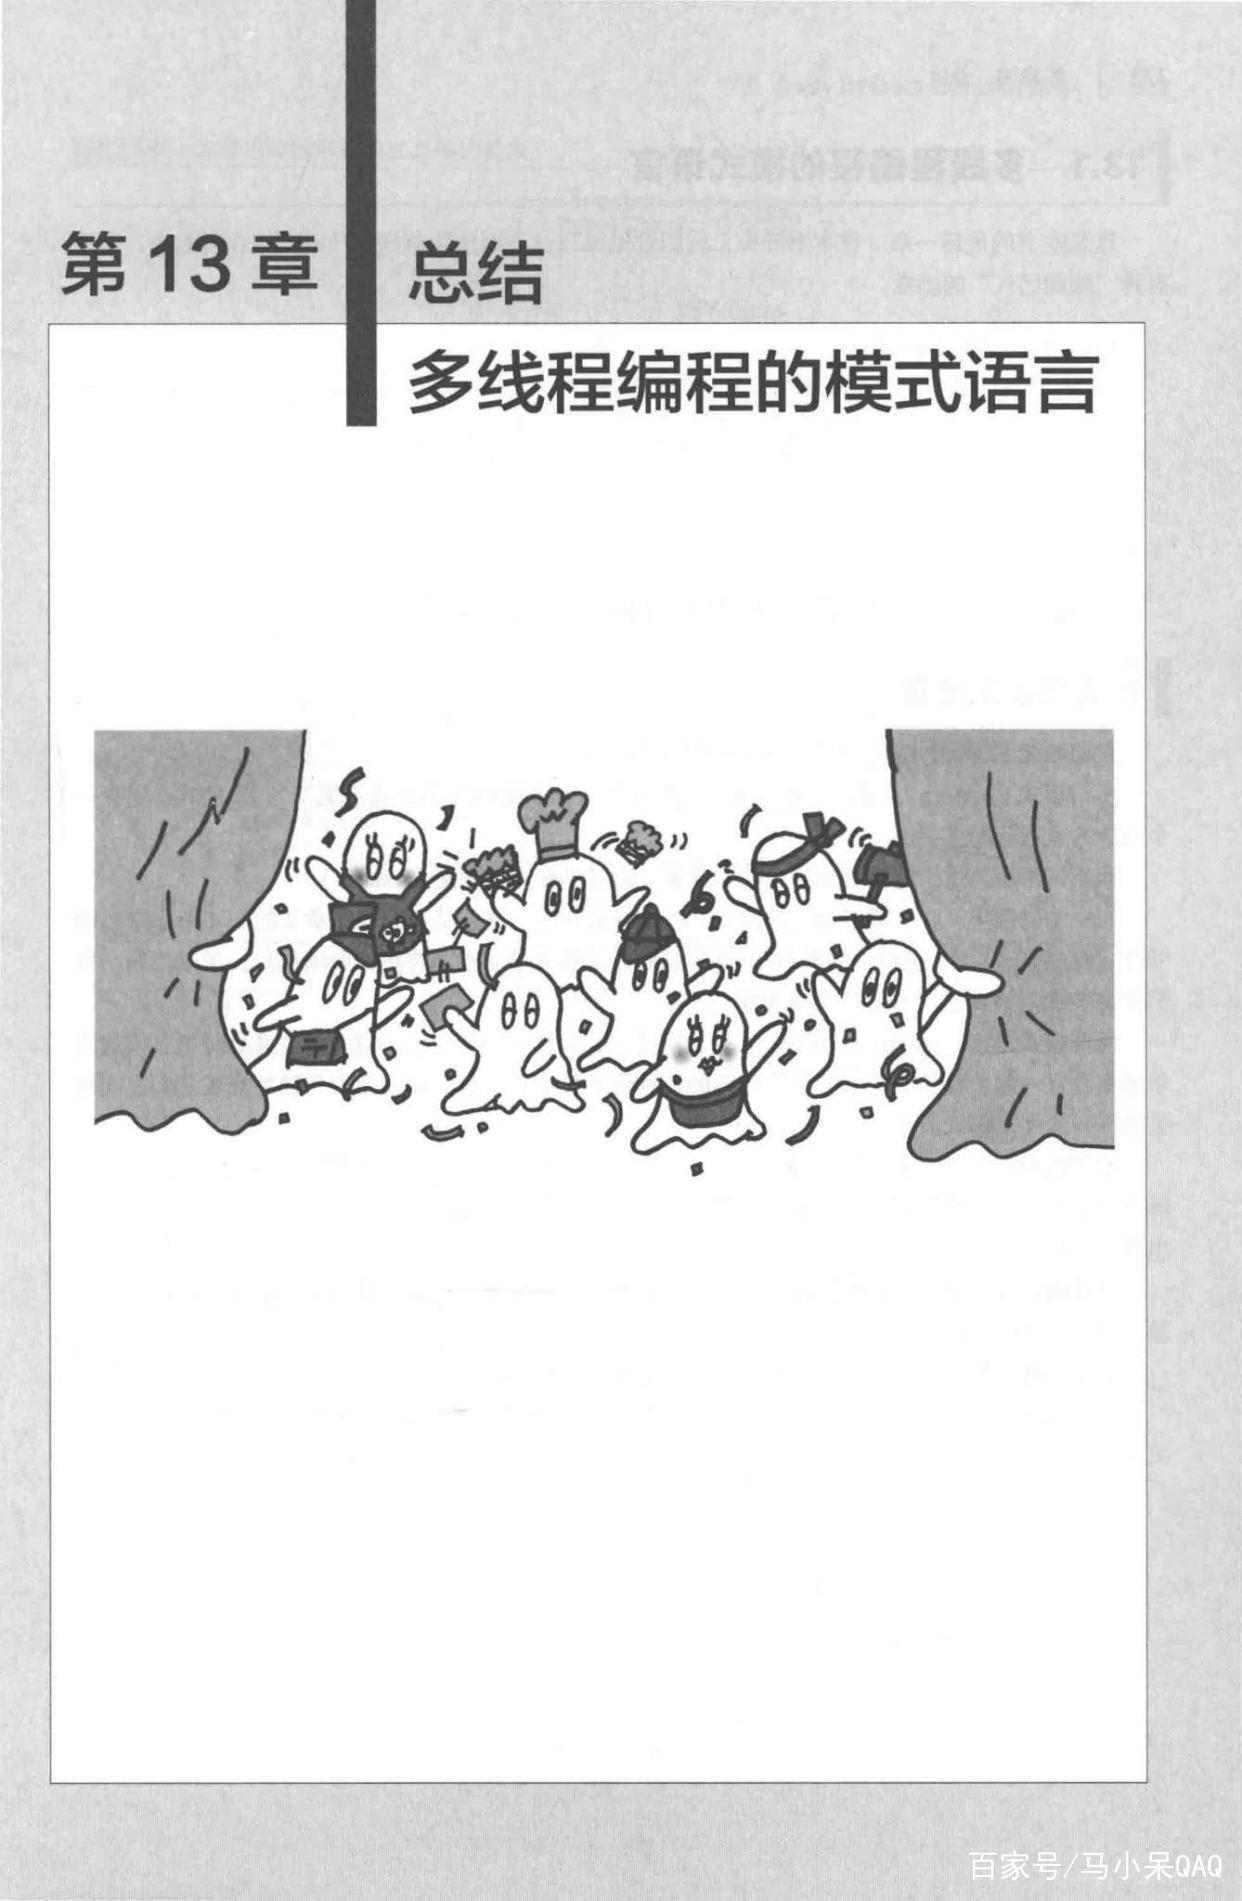 rBAAdmC7DmeAItjvAAJ5W8-oOCs963.jpg插图(1)